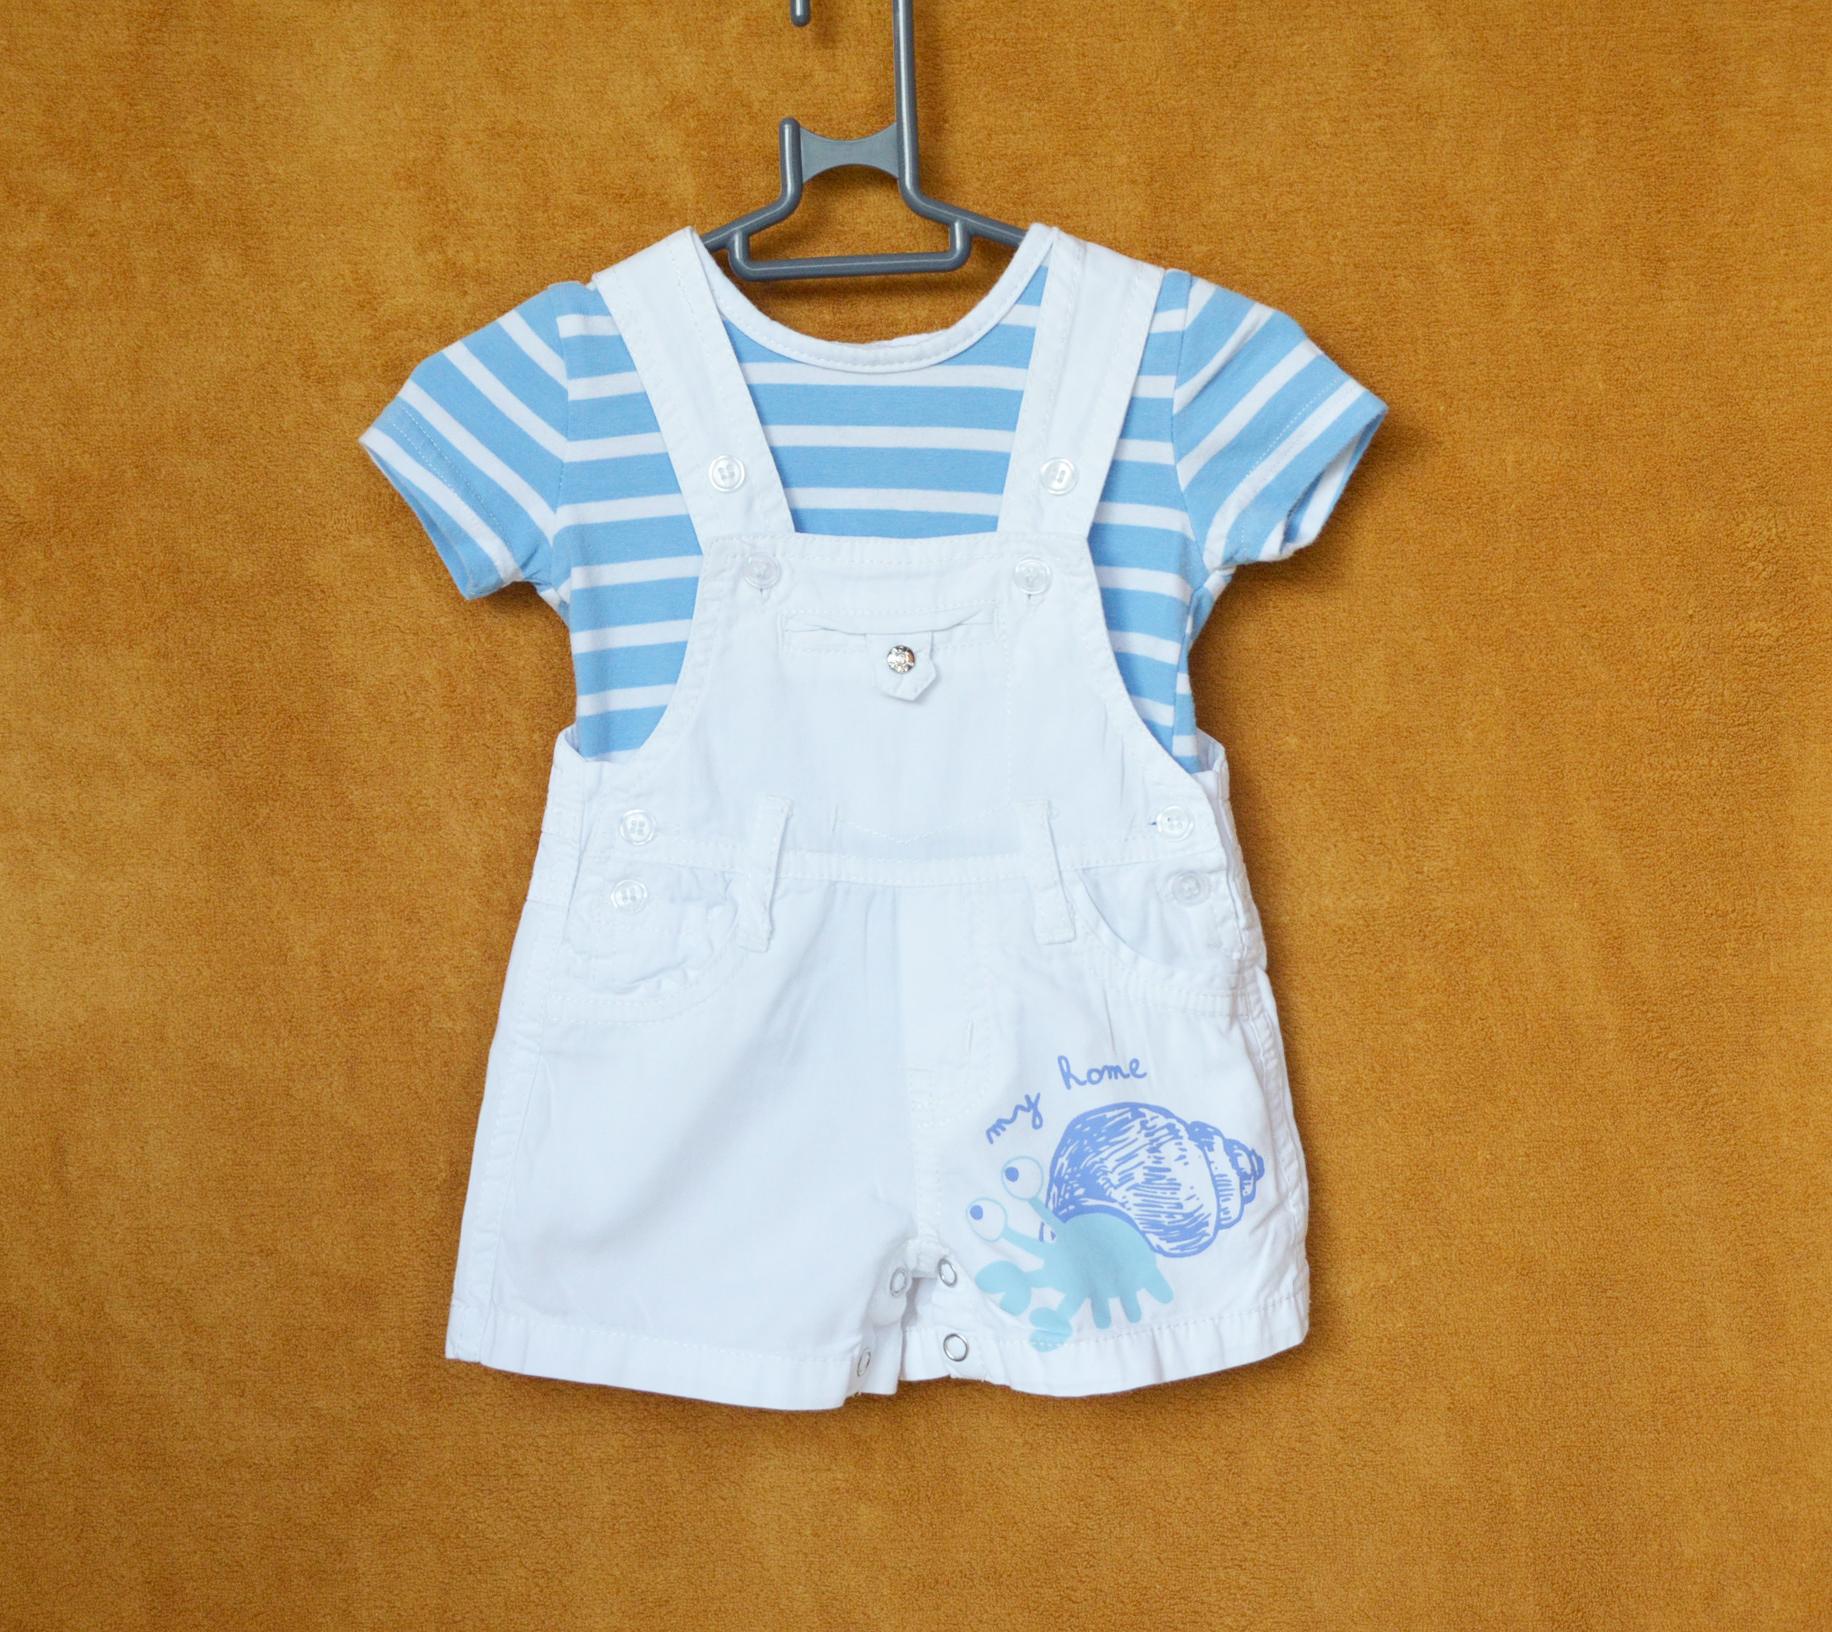 Ensemble Salopette Tee-shirt Bleu à rayure 1 mois - Baby bol